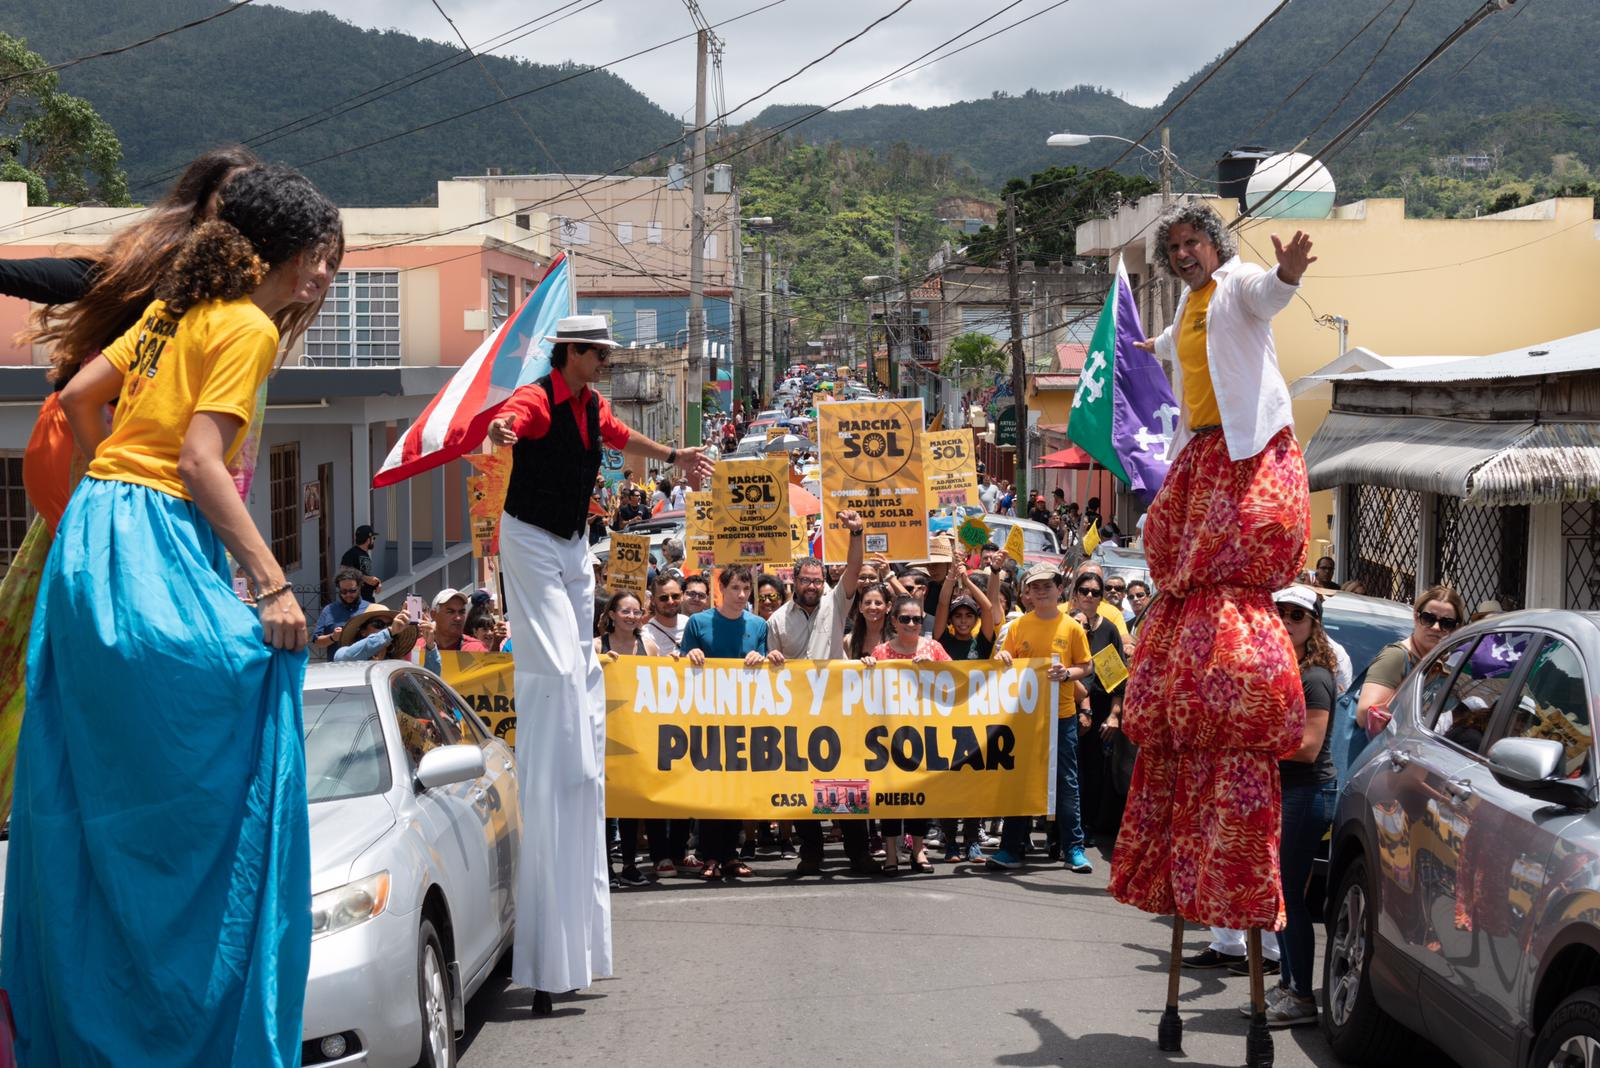 The community of Adjuntas celebrating a solar-powered future for Puerto Rico.  Photo by Ruben Salgado Escudero